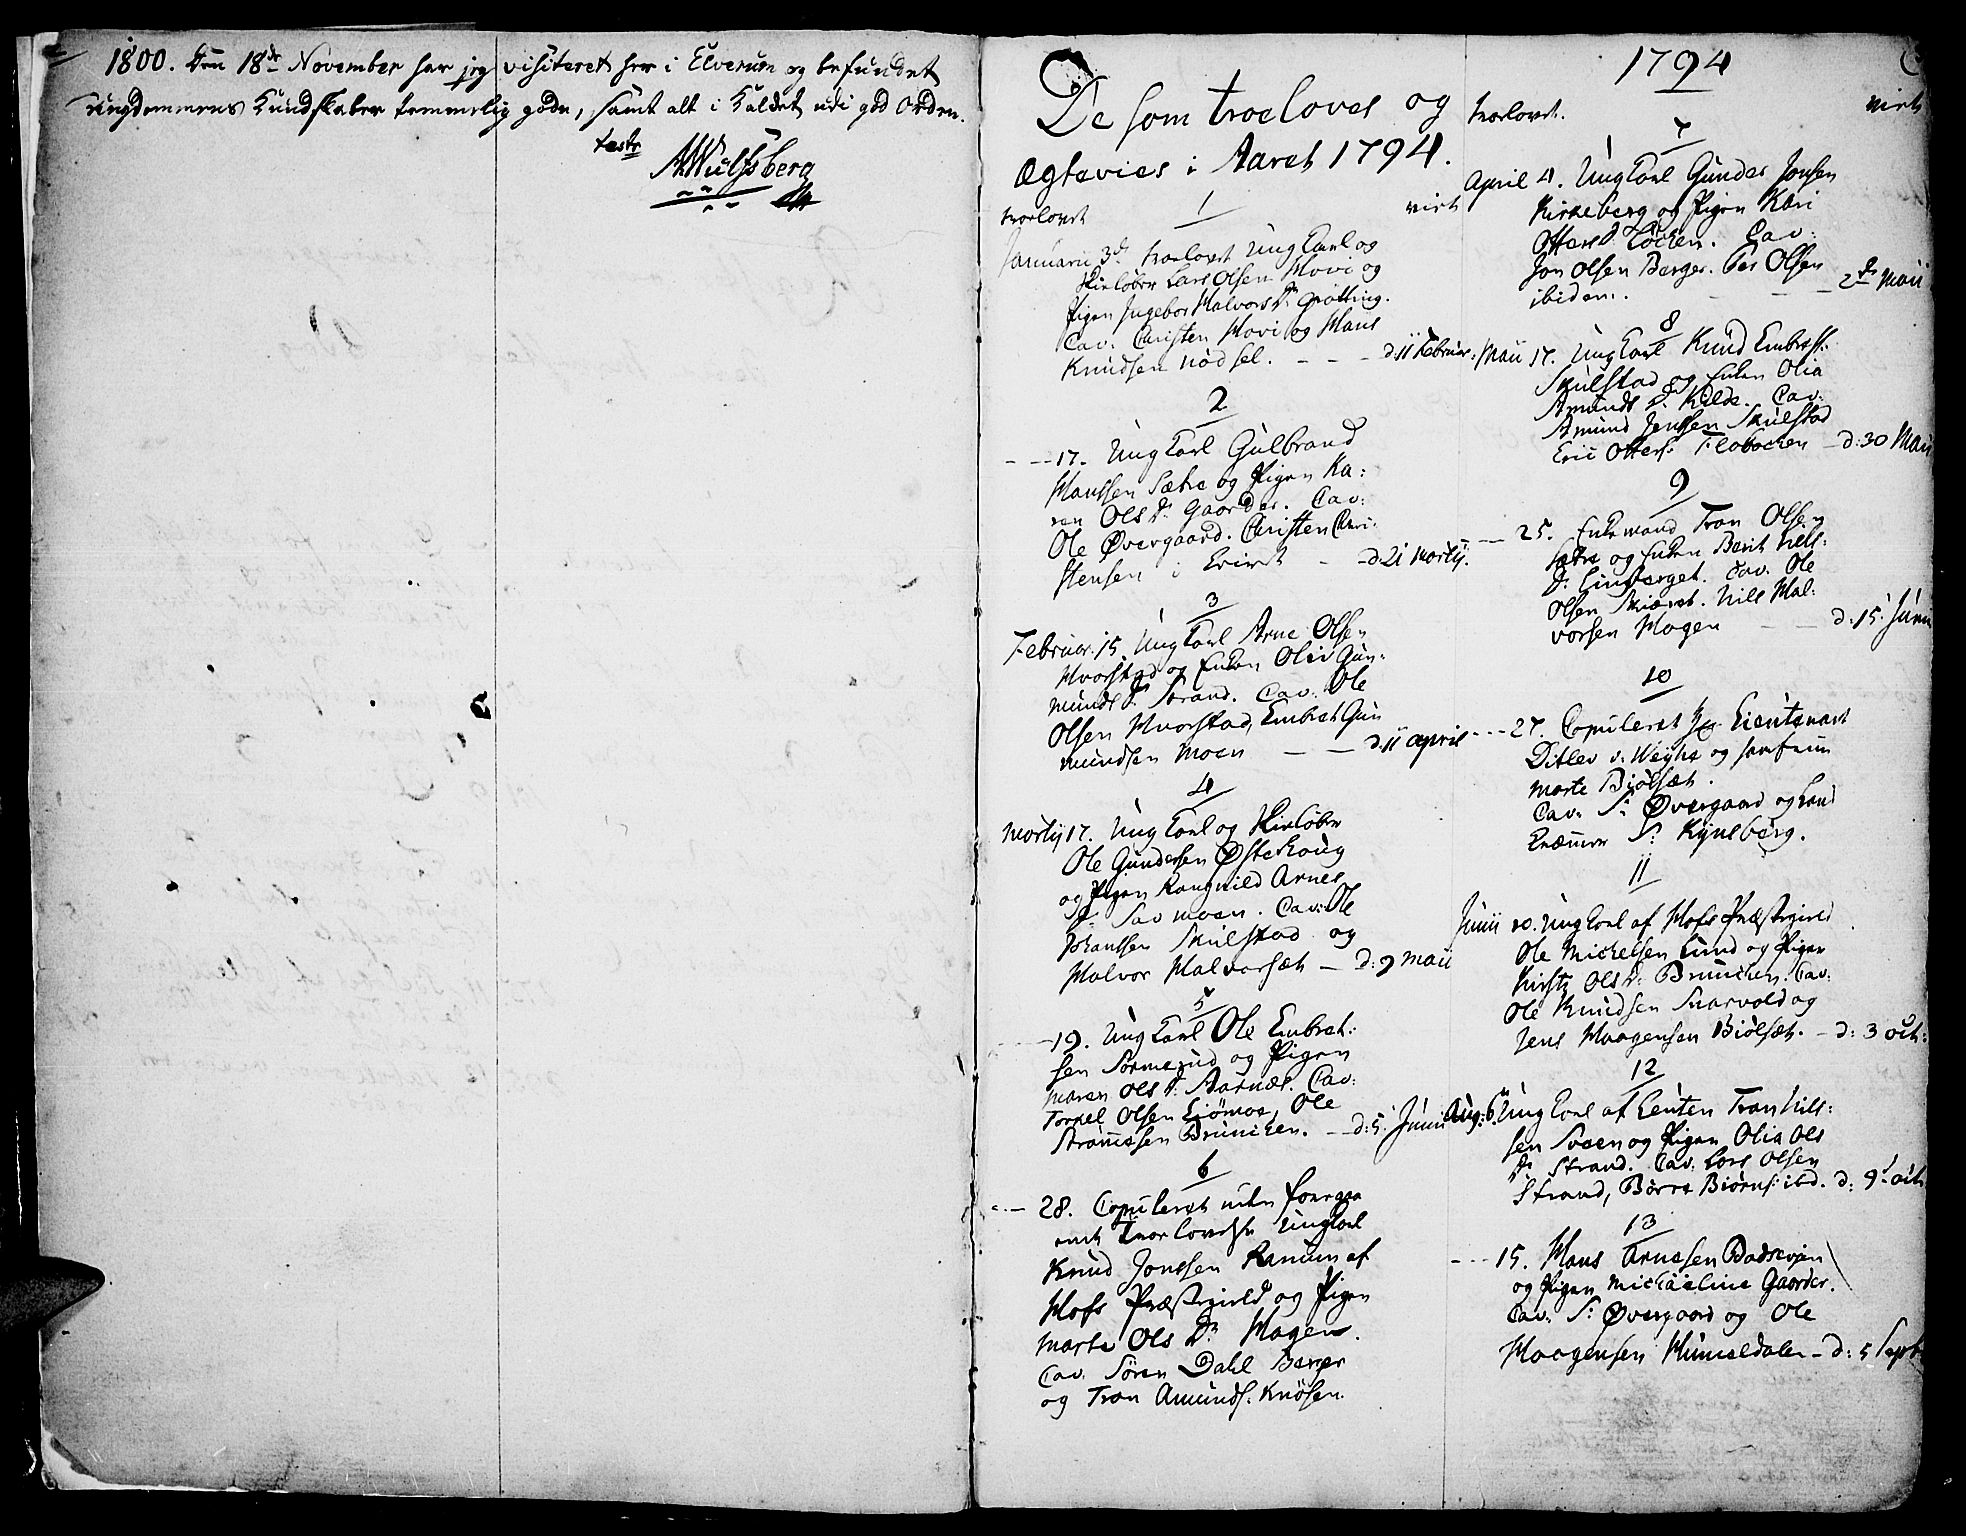 SAH, Elverum prestekontor, H/Ha/Haa/L0006: Ministerialbok nr. 6, 1794-1814, s. 2-3